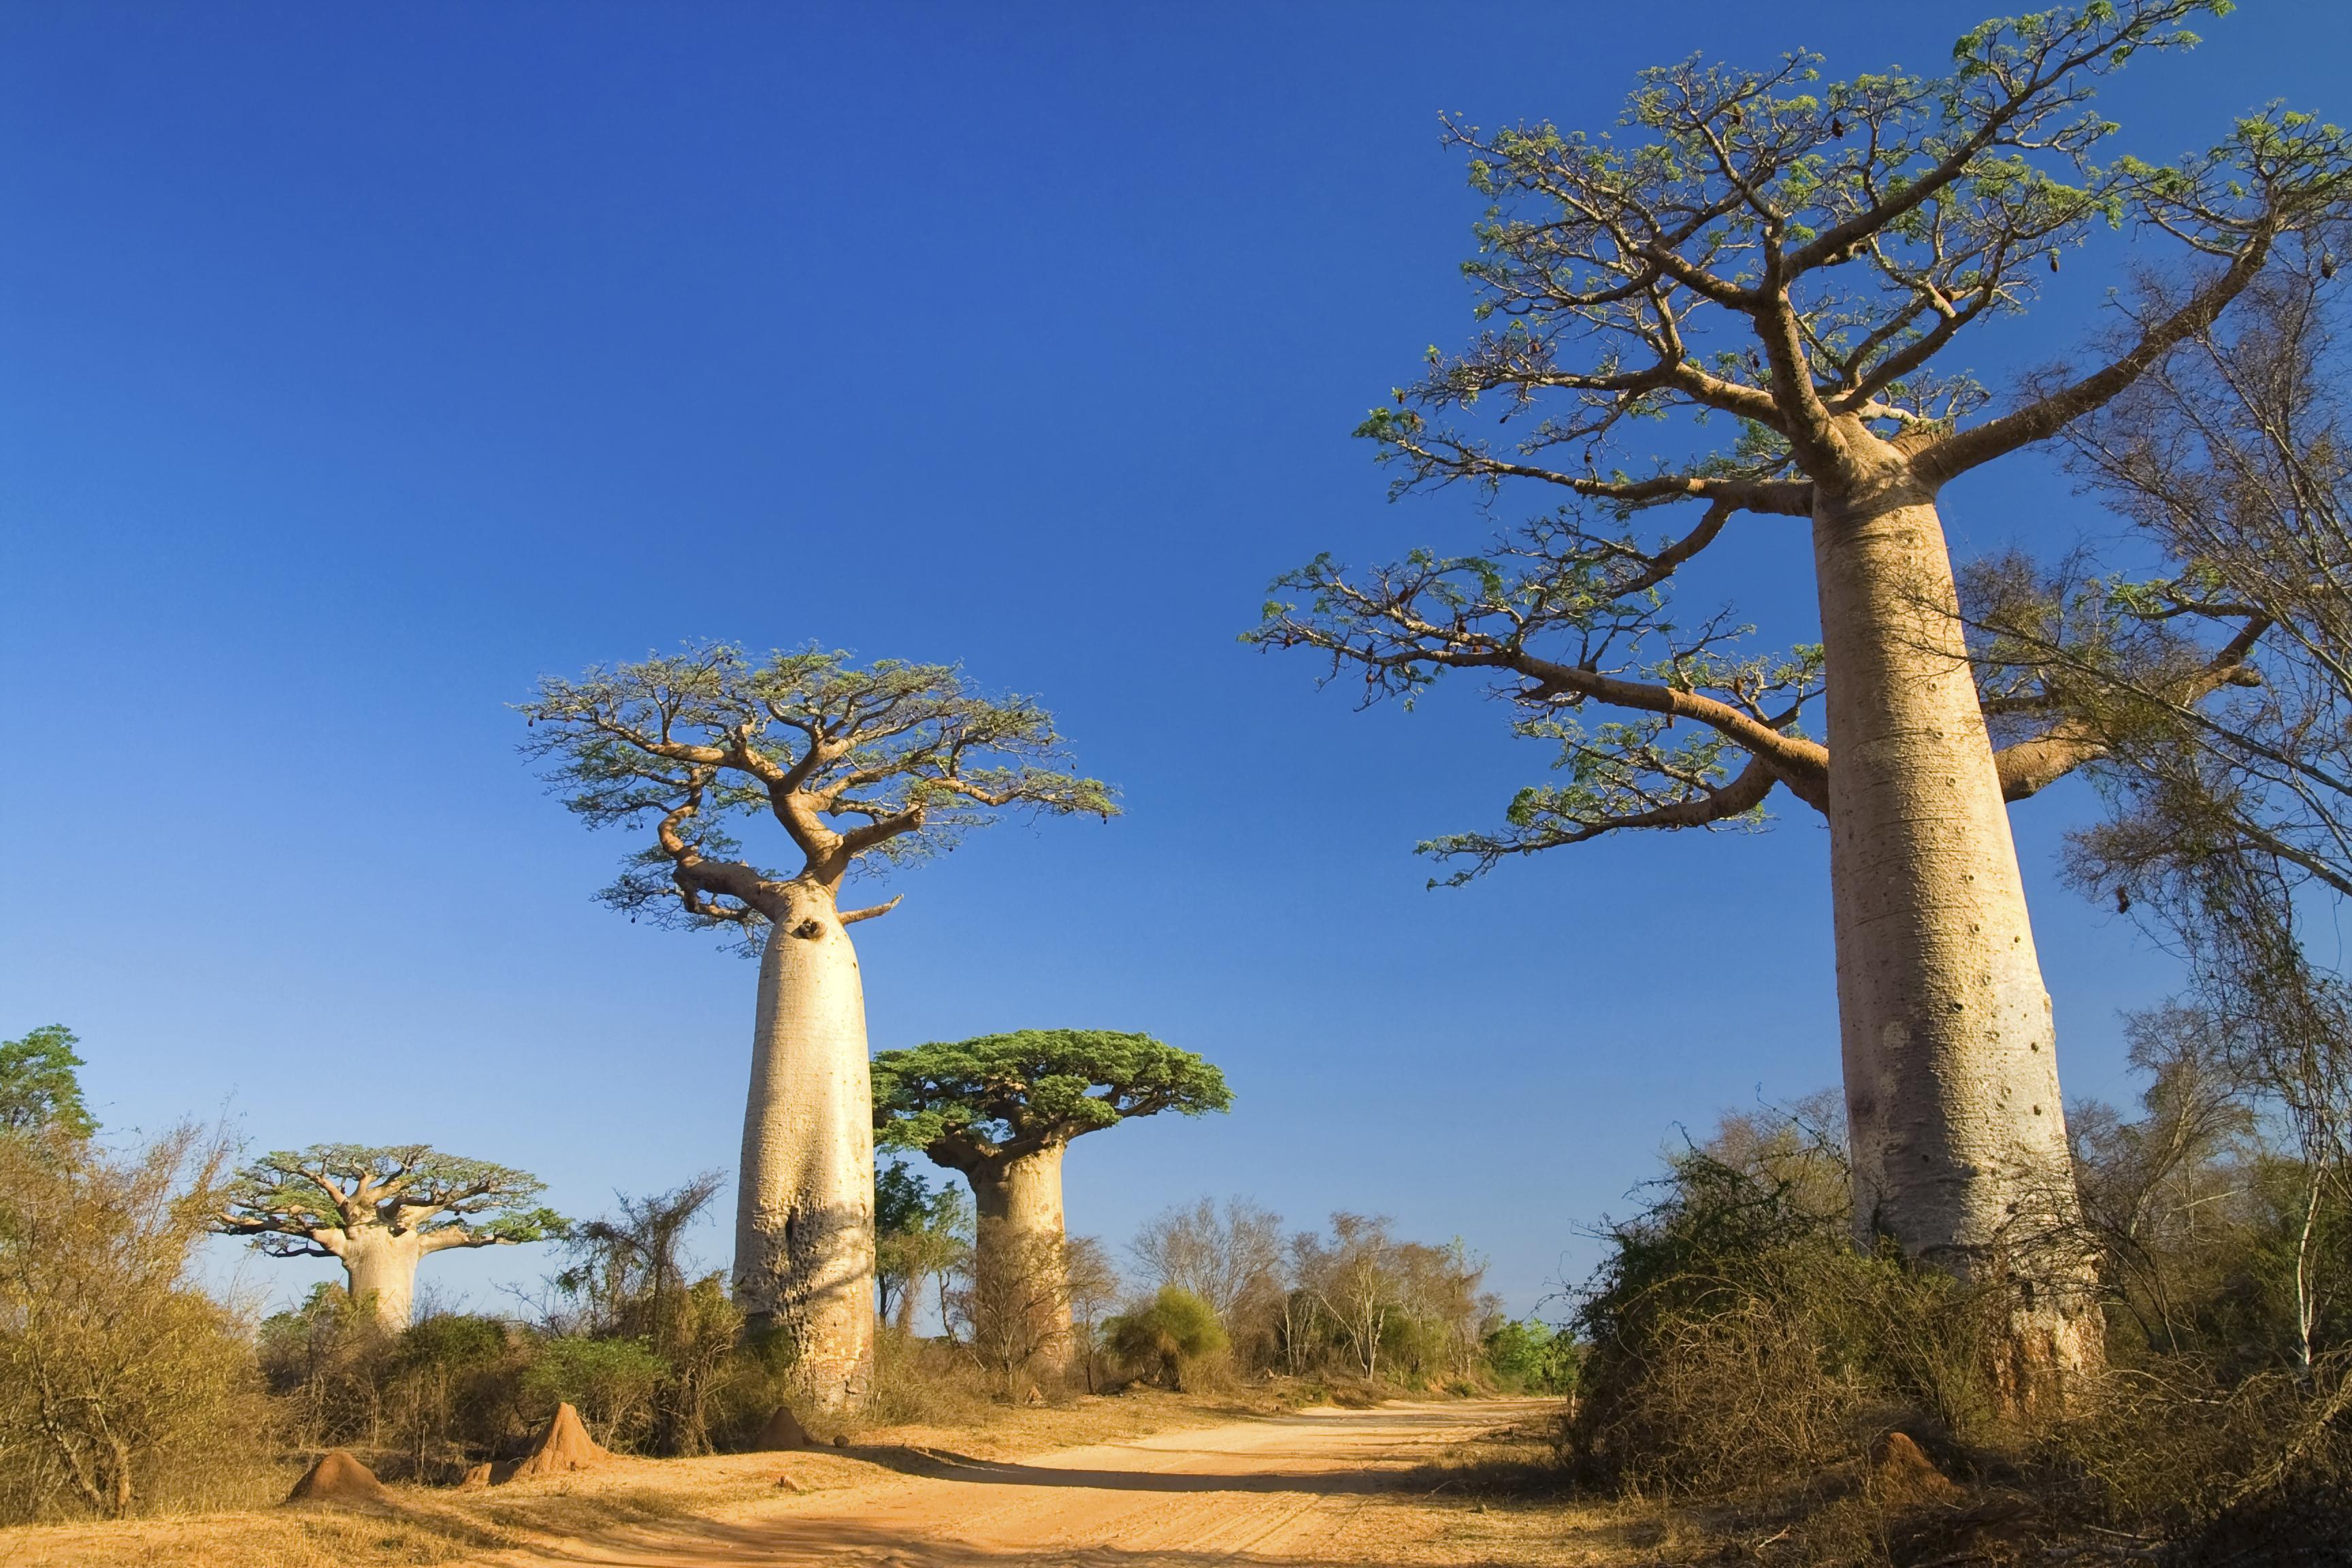 Madagascar's baobab trees